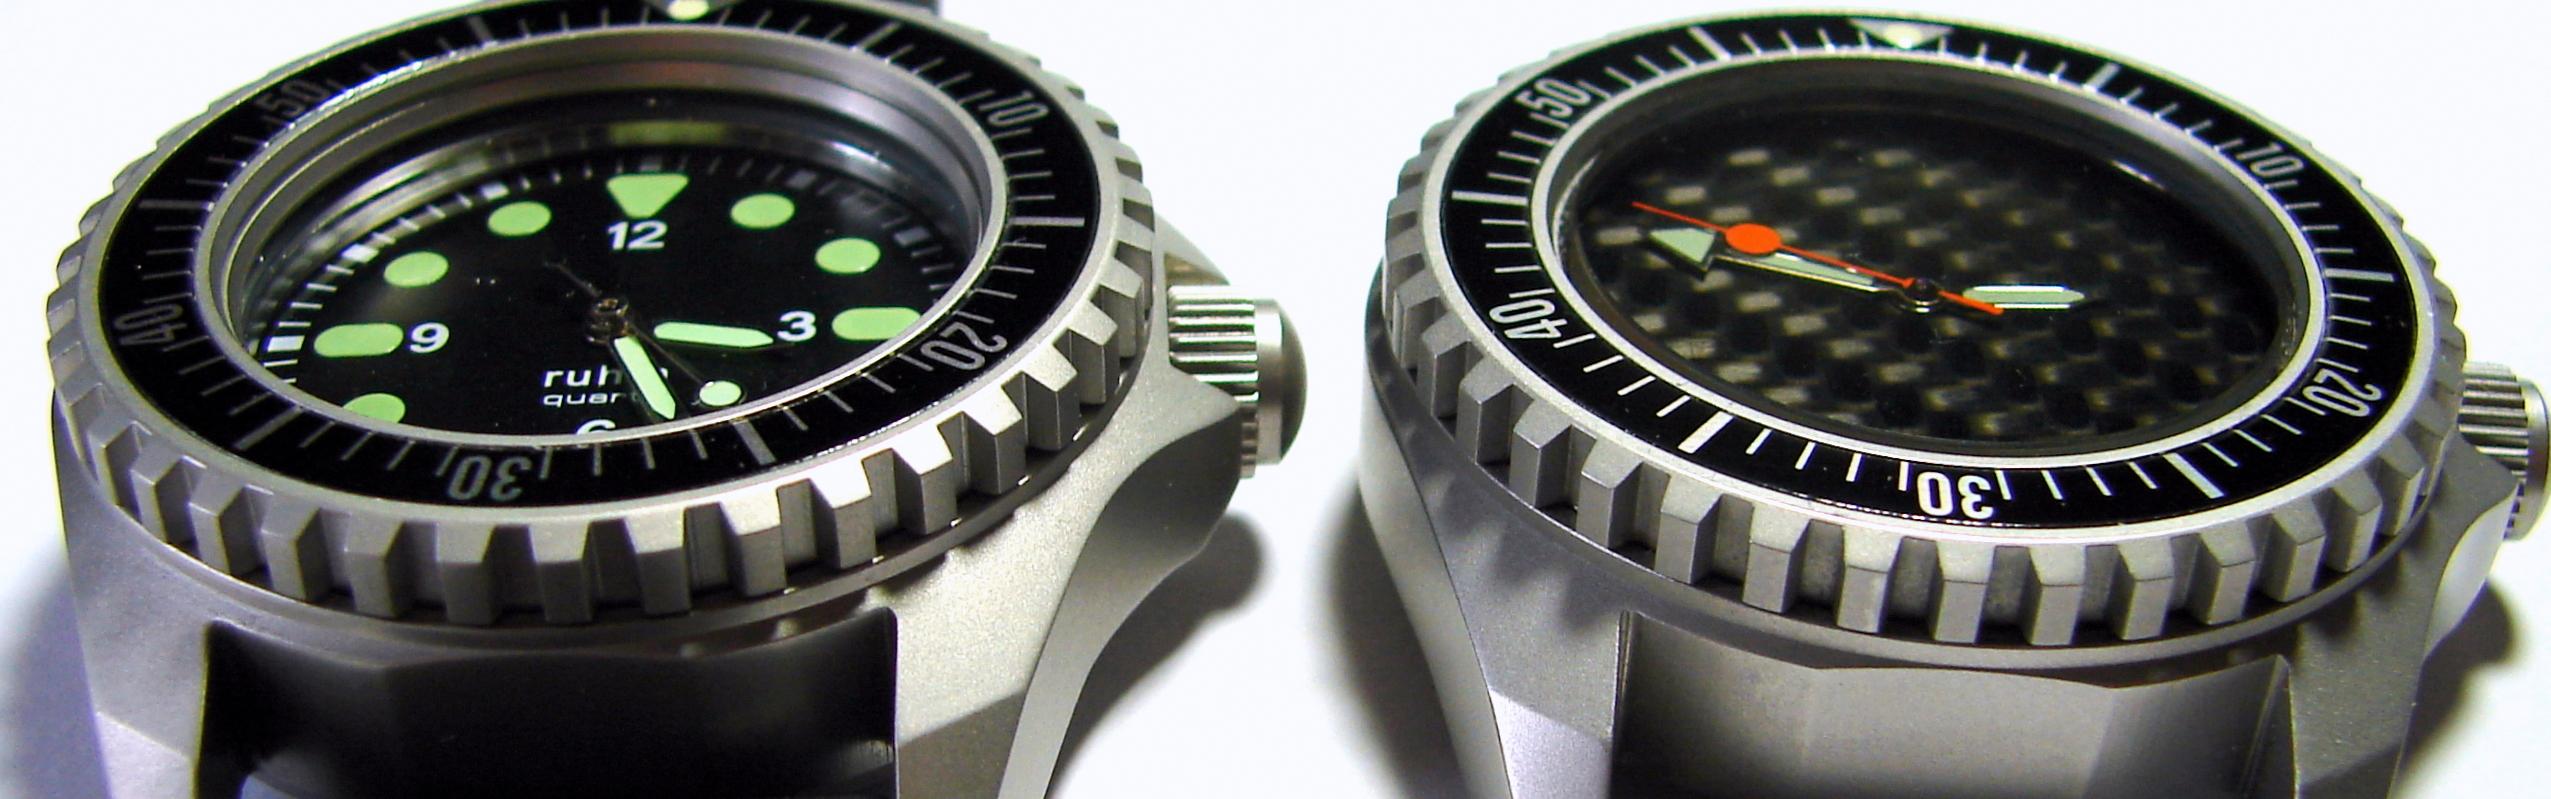 vergleich Replika I gegen LIPORIS Kampfschwimmeruhr mit spezial Doppelglas Design geschützt